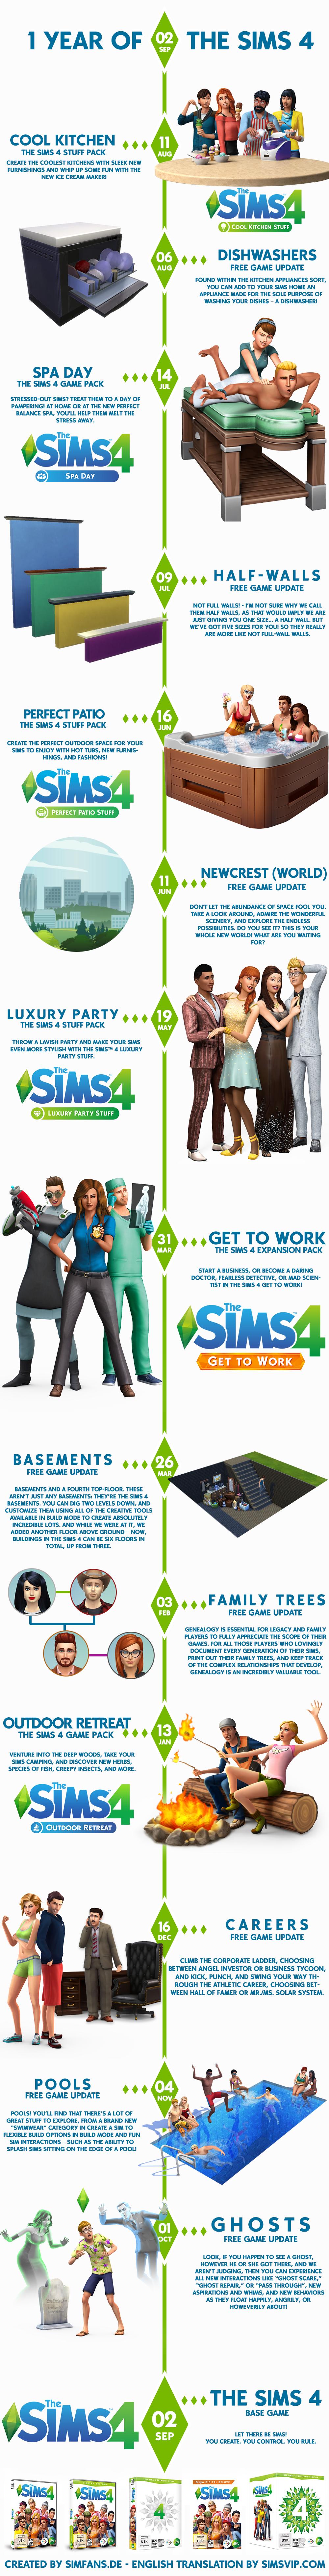 Sims 4 Timeline - SimsVIP